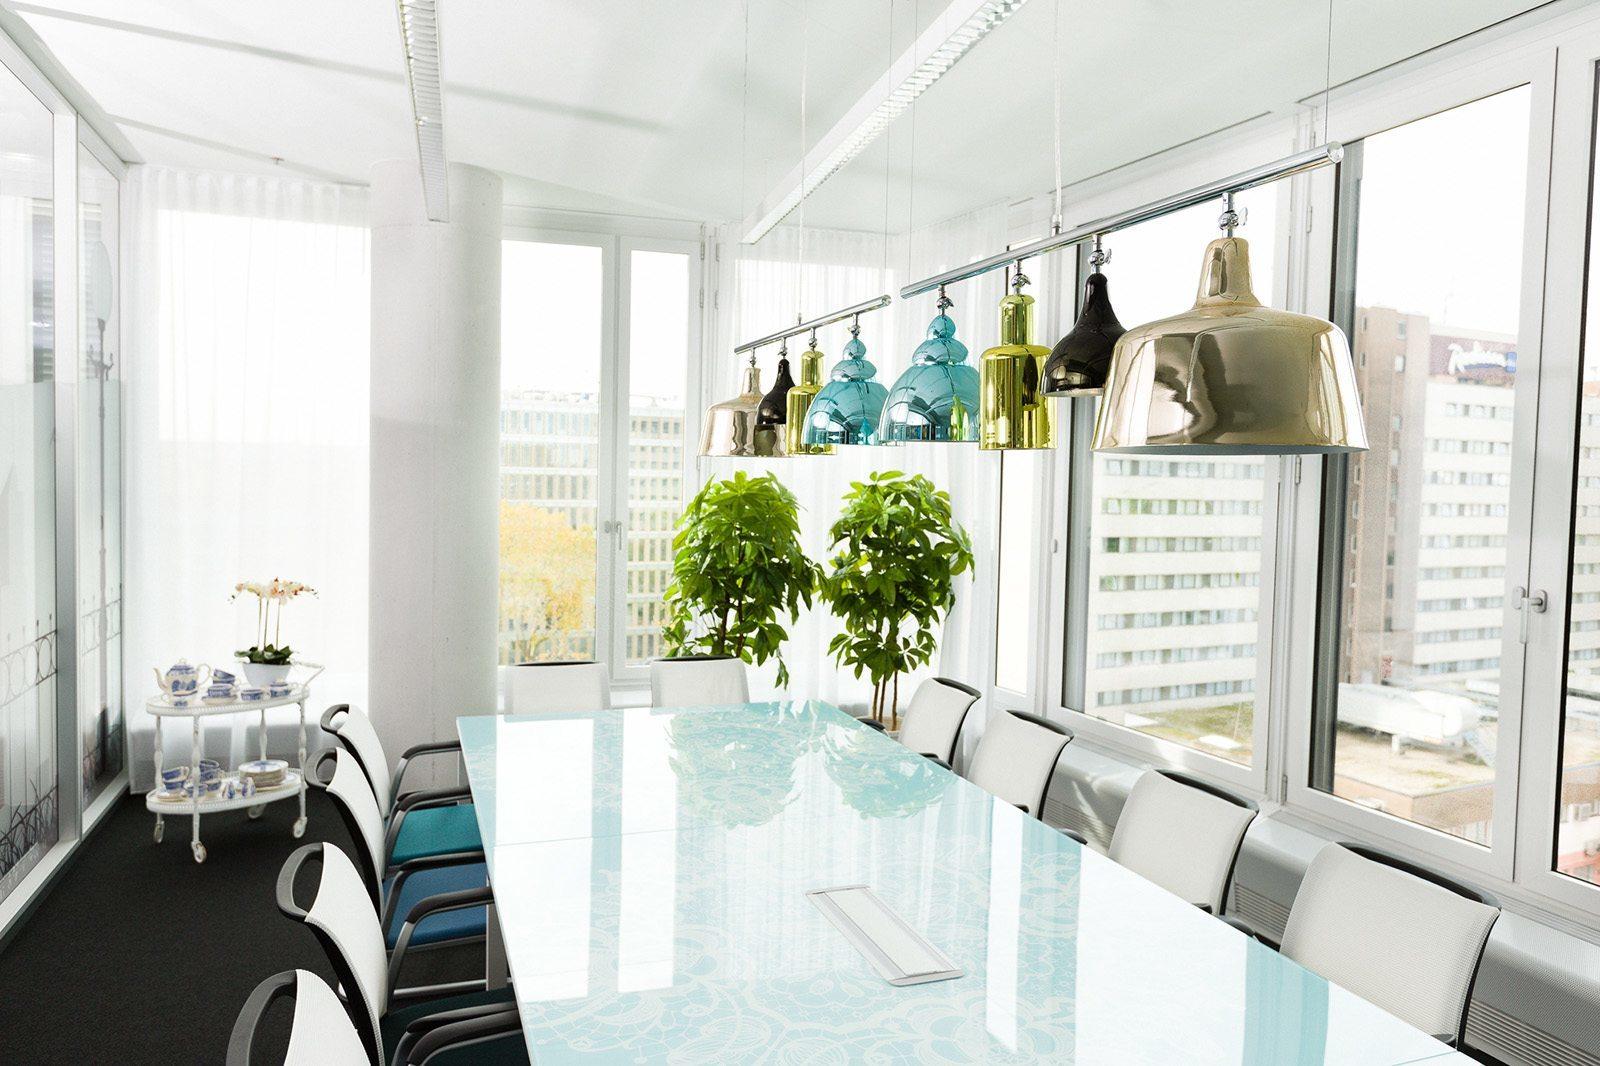 Trivago sky office 24 officelovin 39 - Trivago office dusseldorf ...